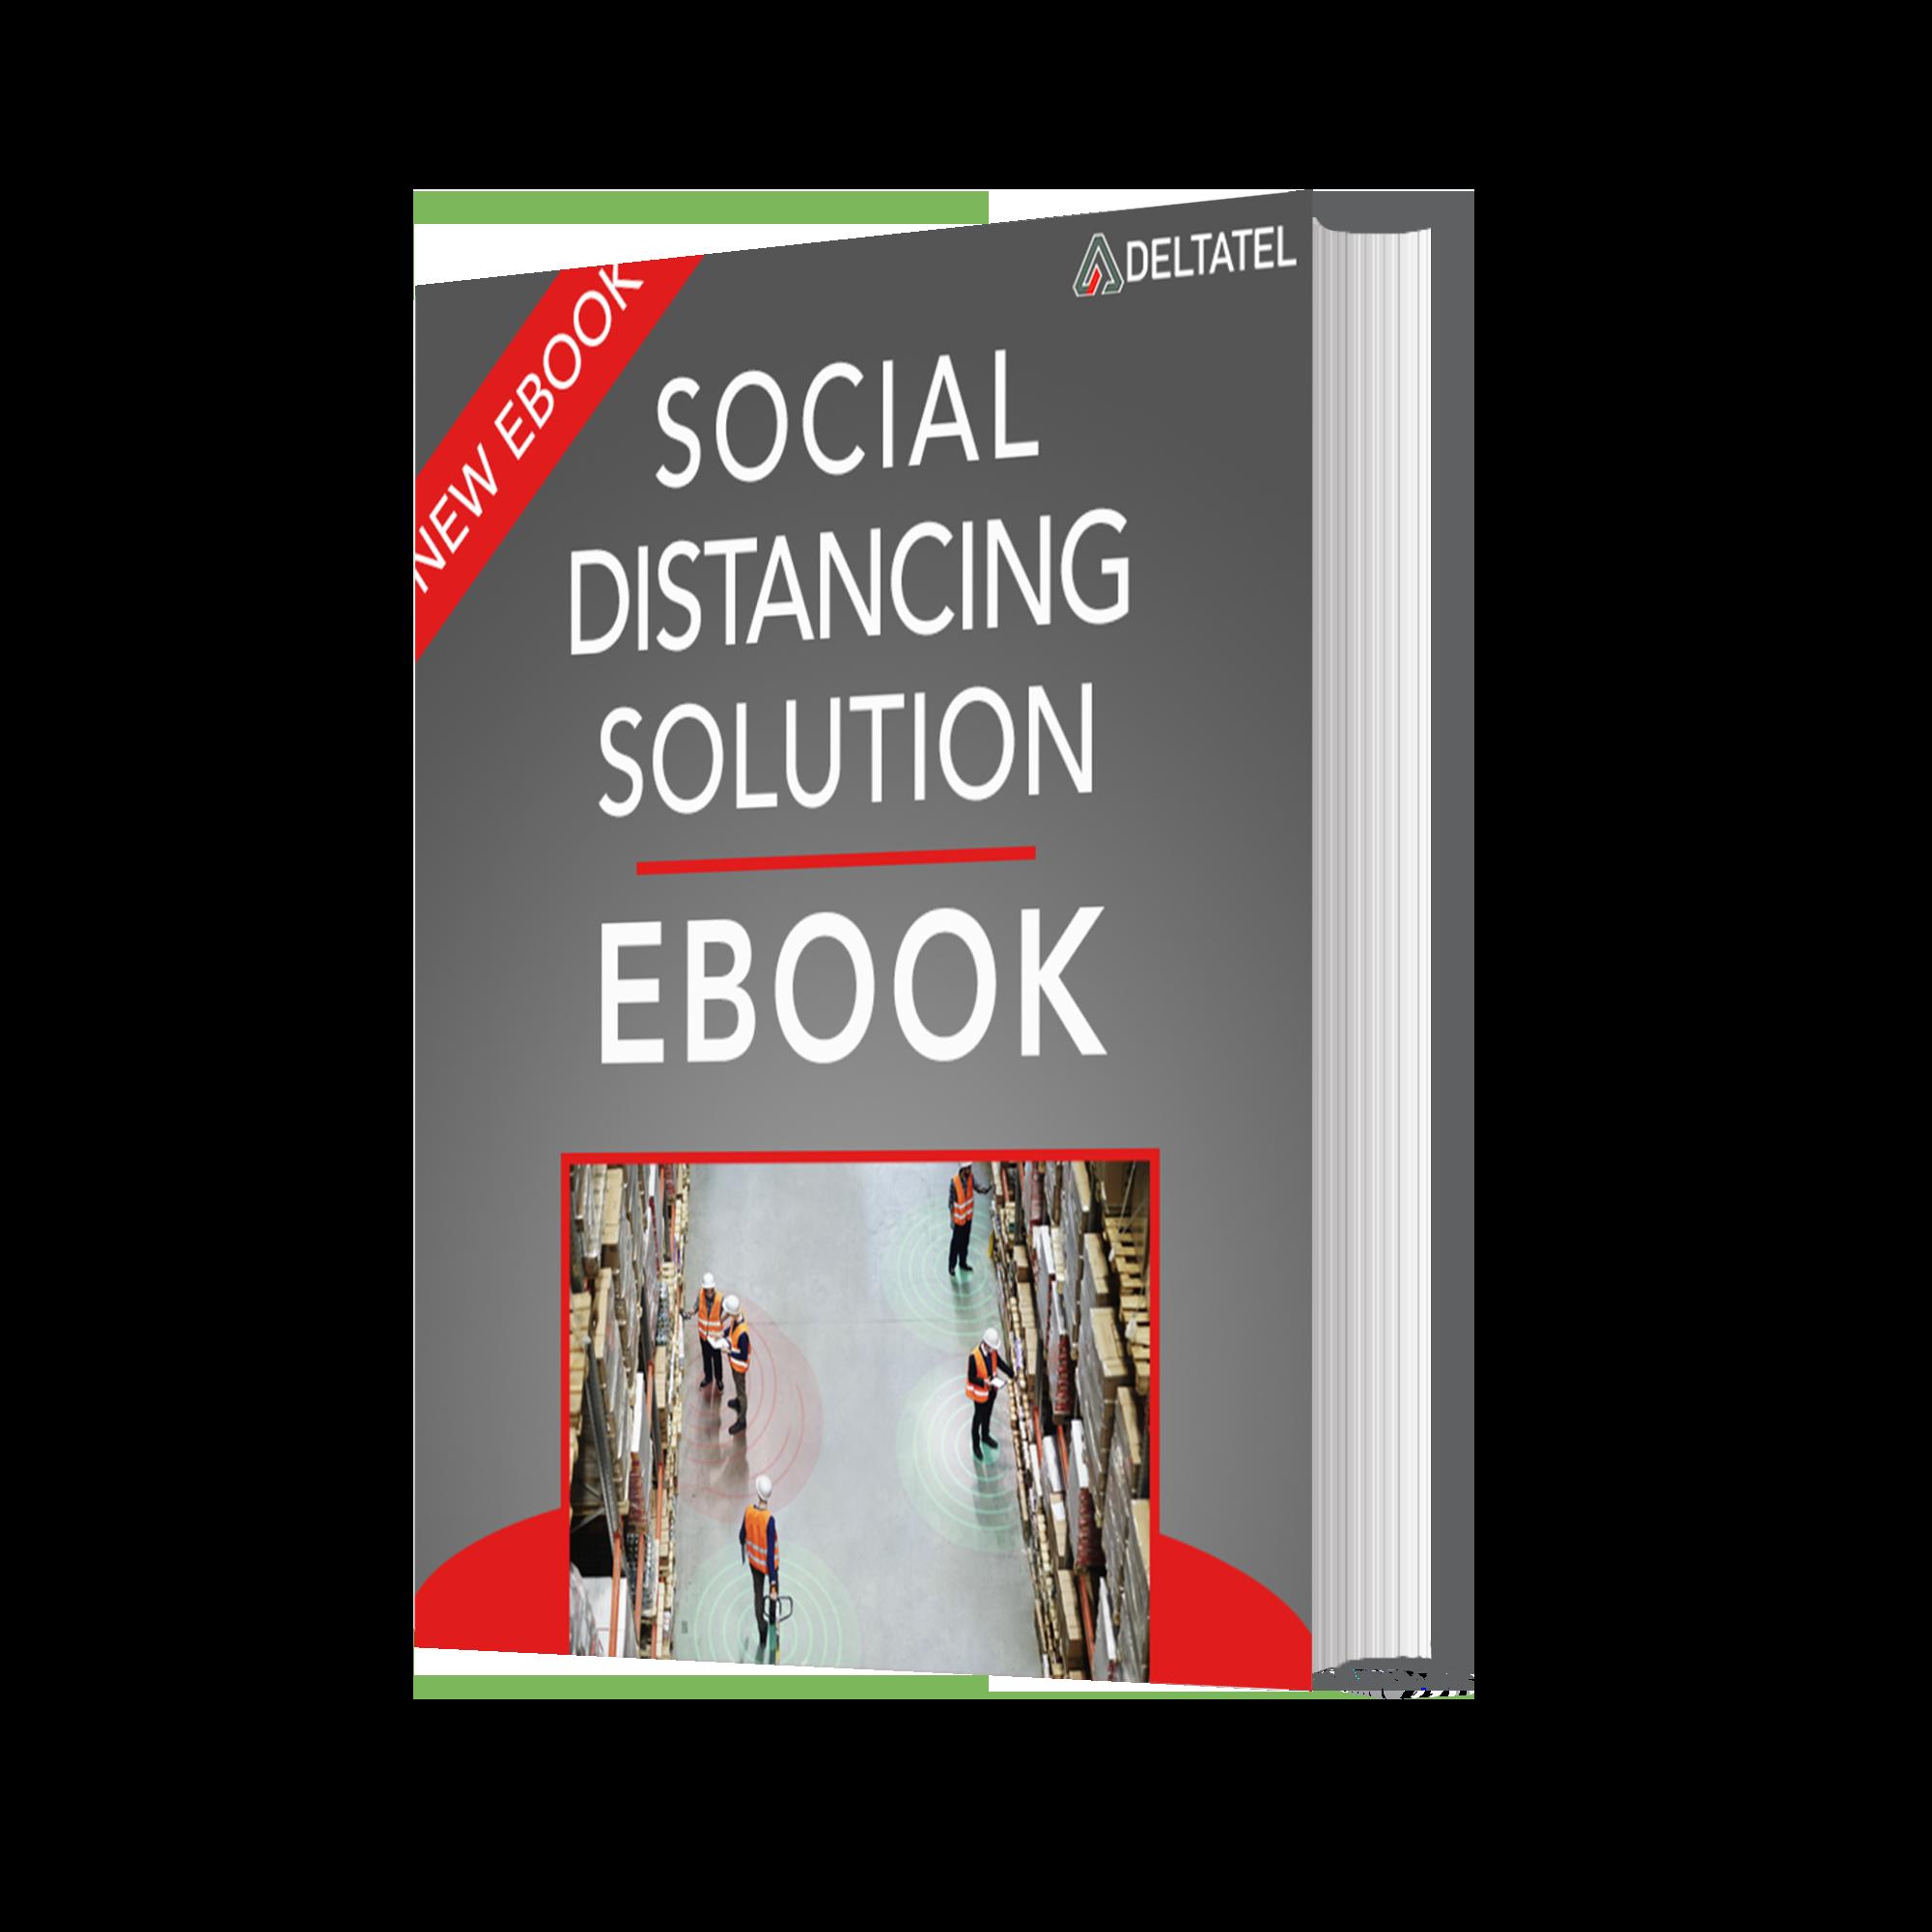 social distancing ebook cover